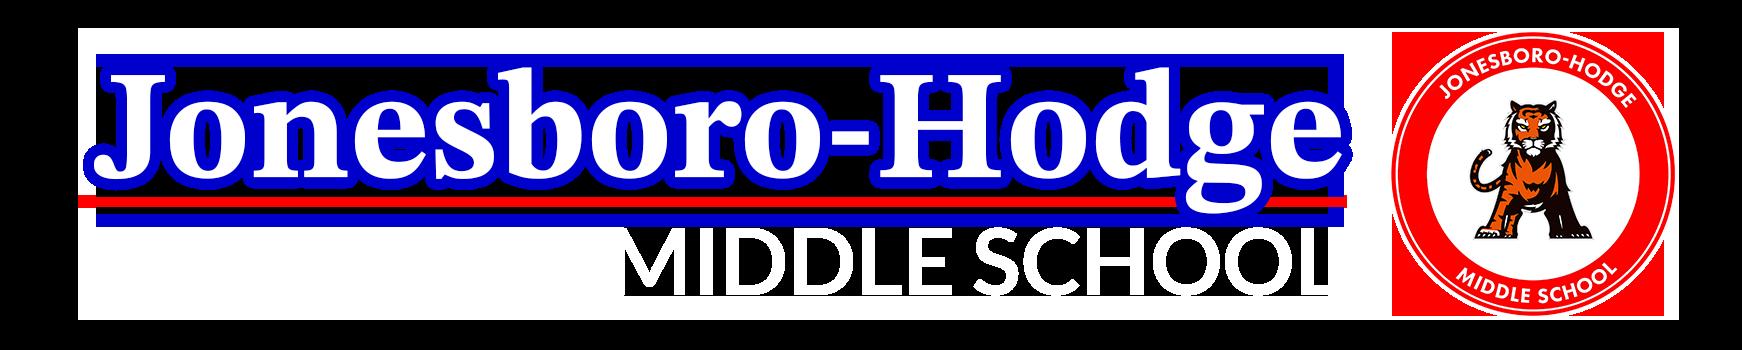 Jonesboro-Hodge Middle SchoolLogo